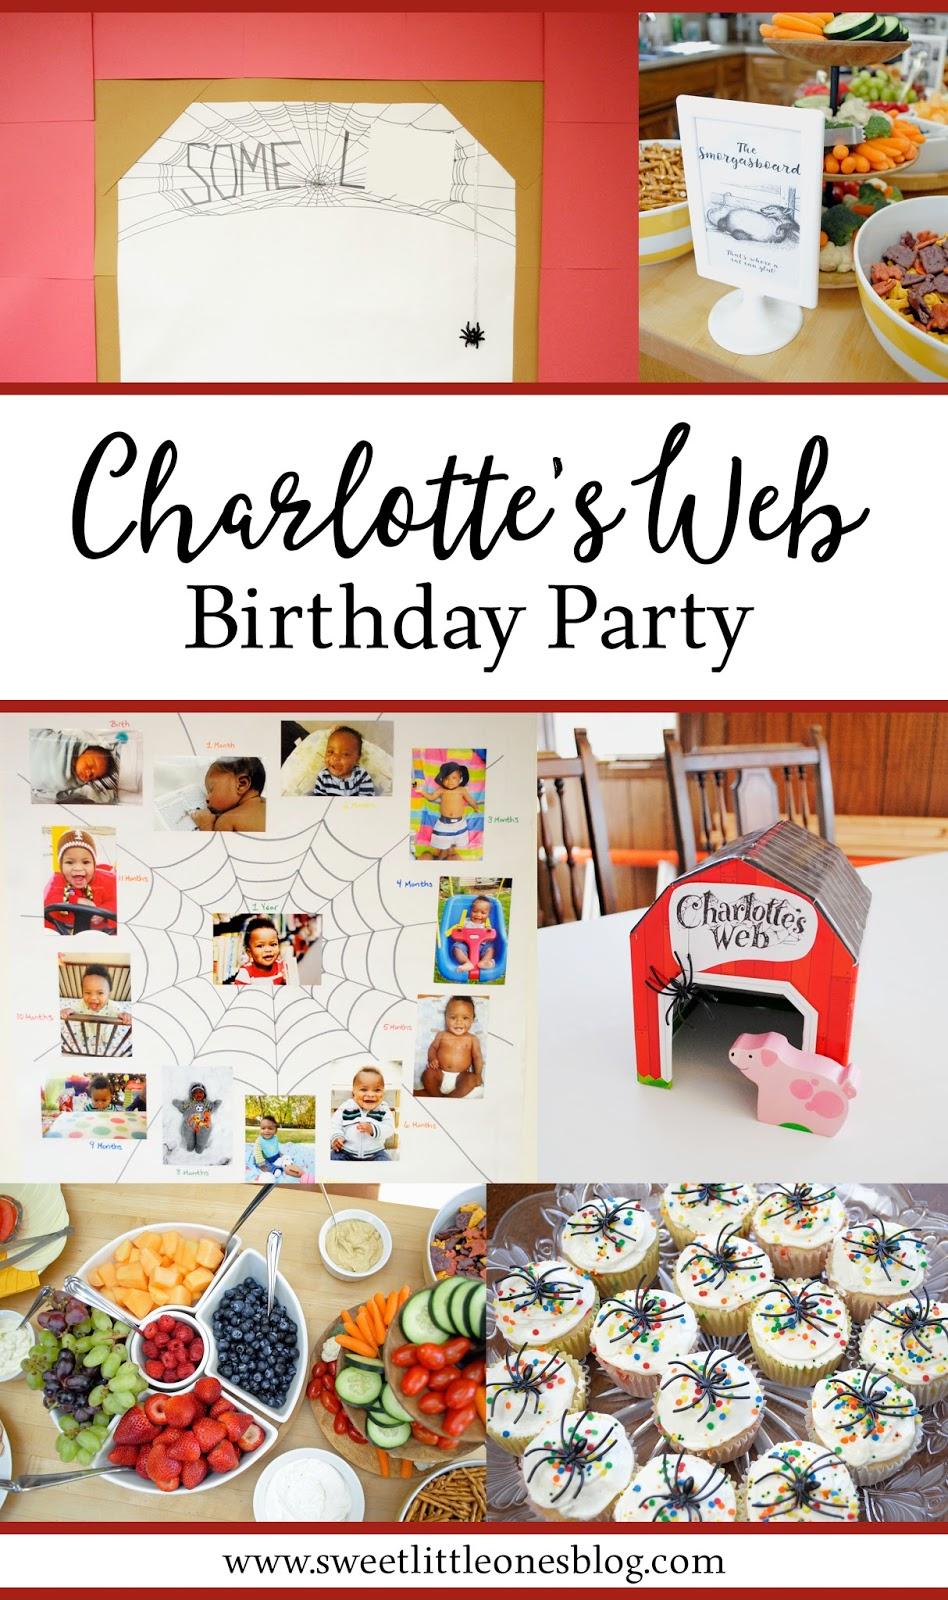 Charlotteu0027s Web 1st Birthday Party